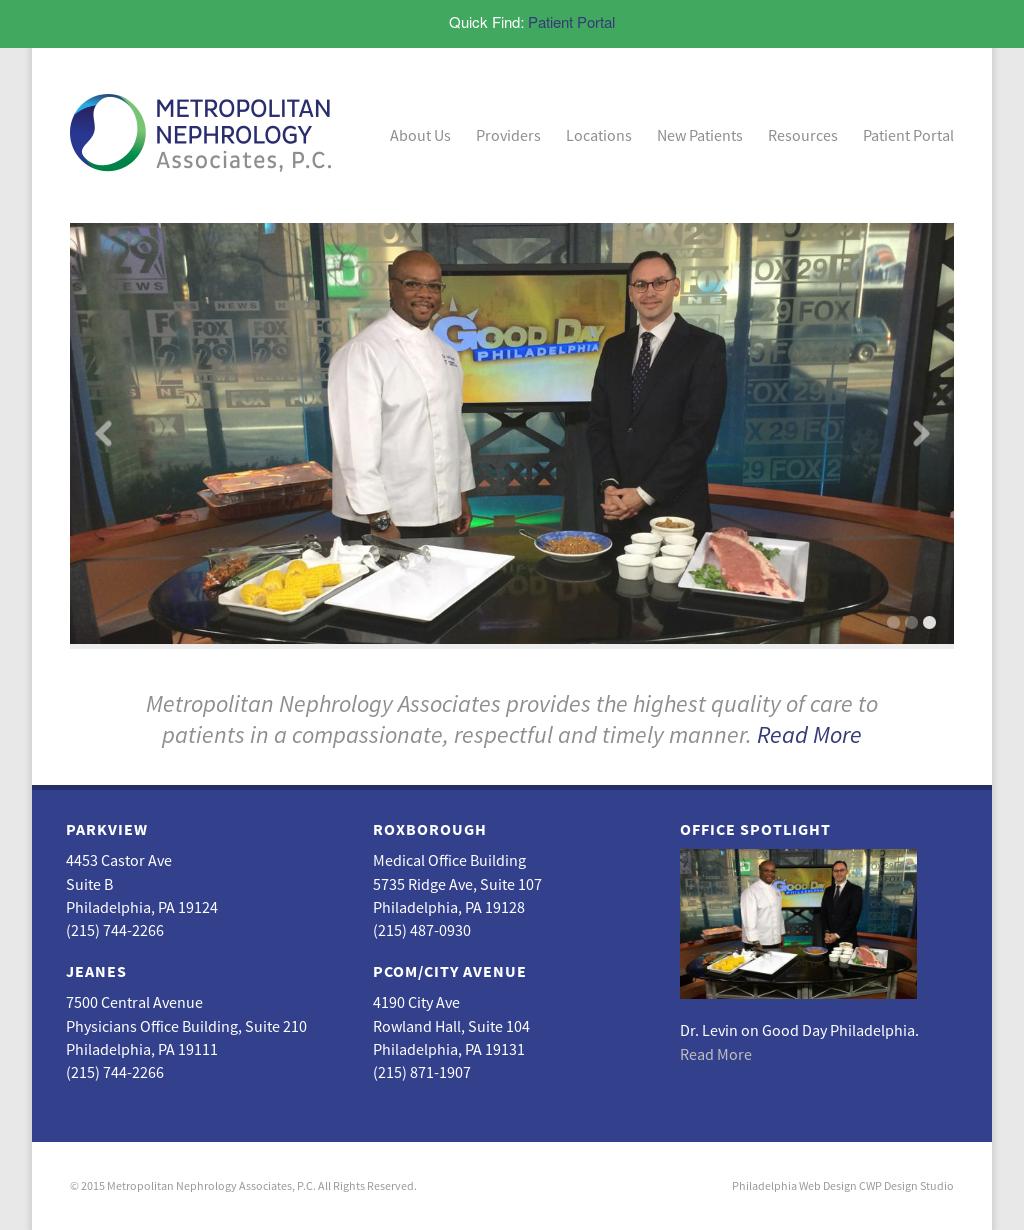 Metropolitan Nephrology Associates Competitors, Revenue and